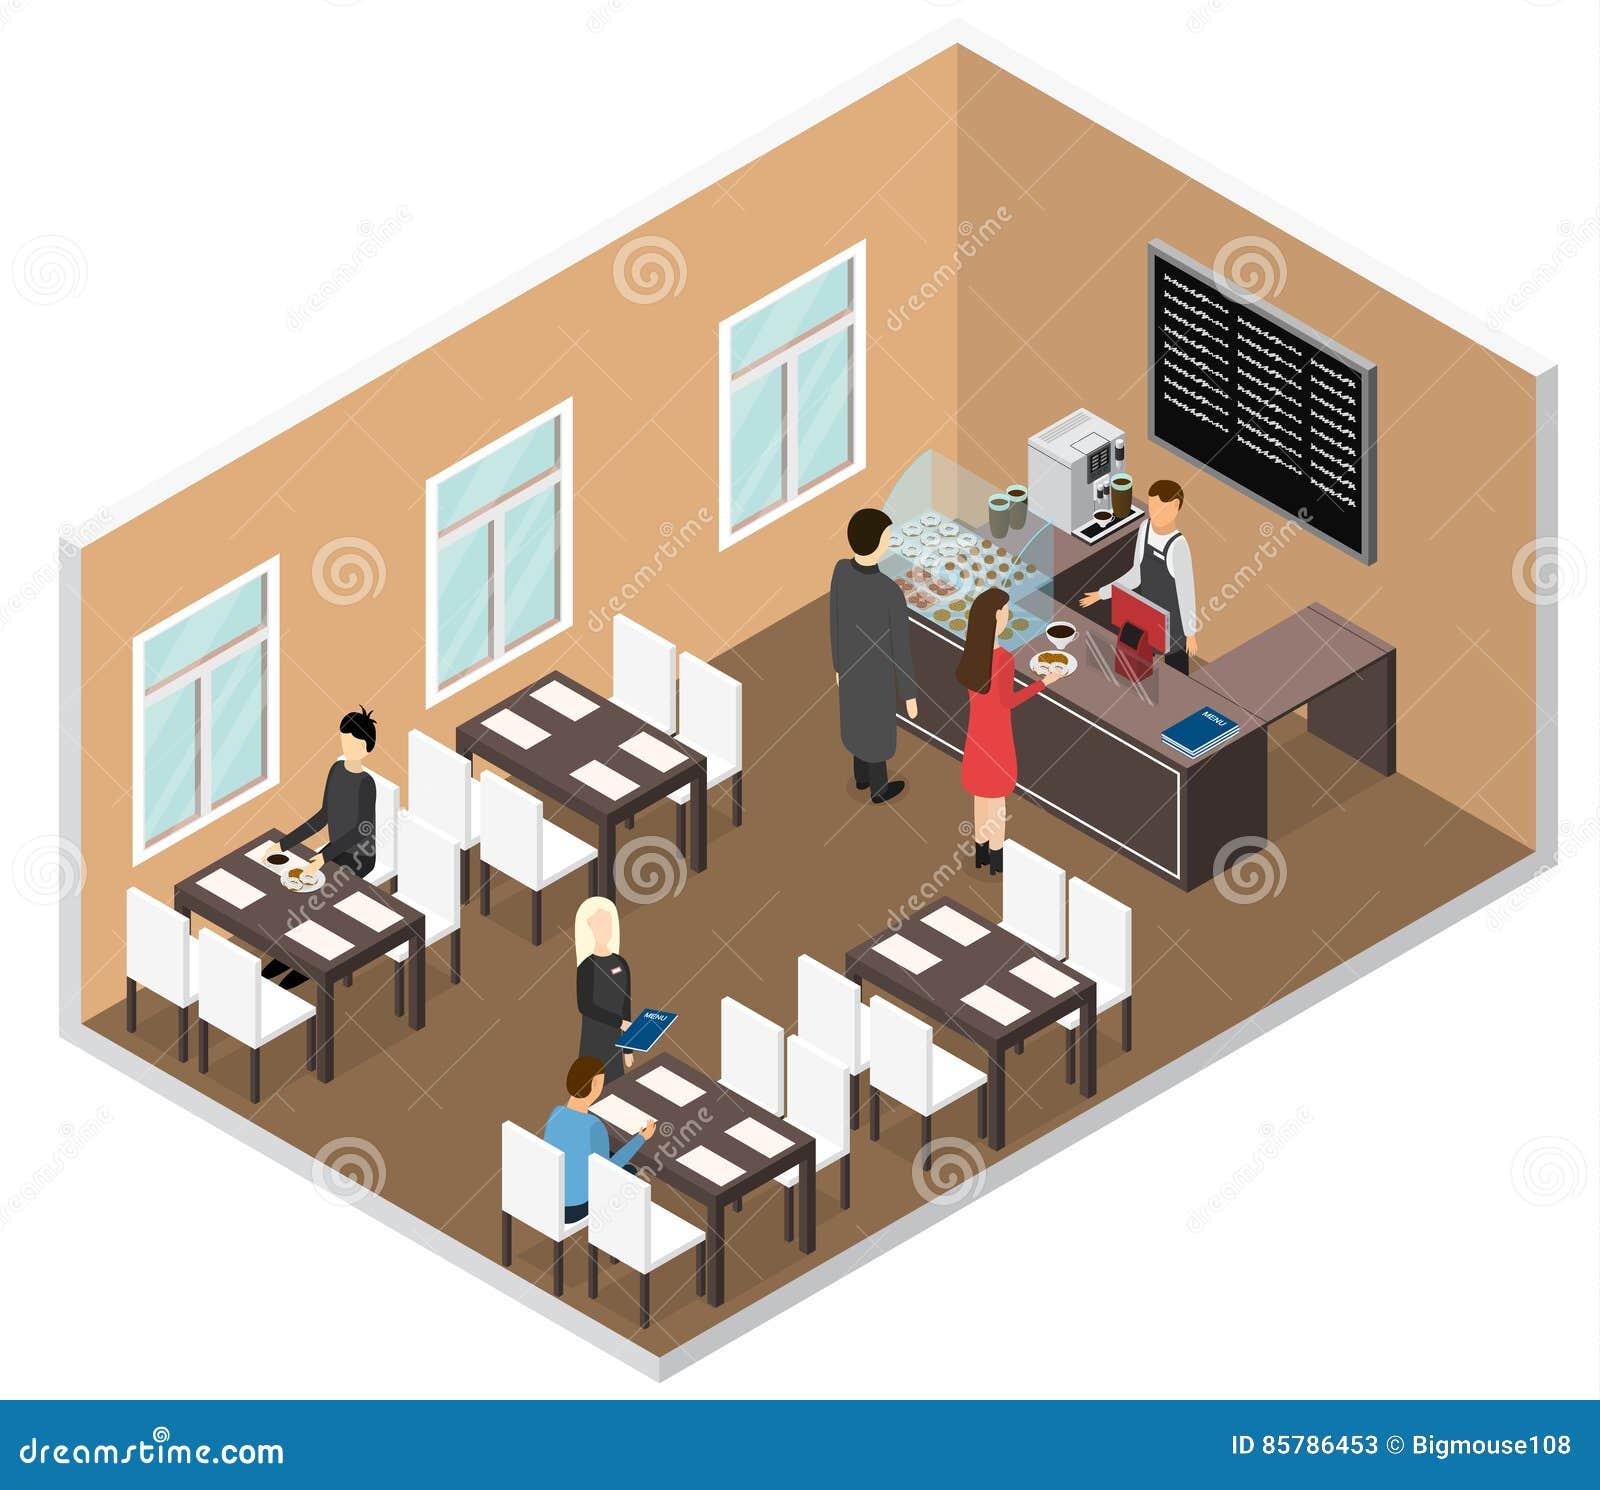 3d Floor Plan Isometric: Cafe Isometric View. Vector Stock Vector